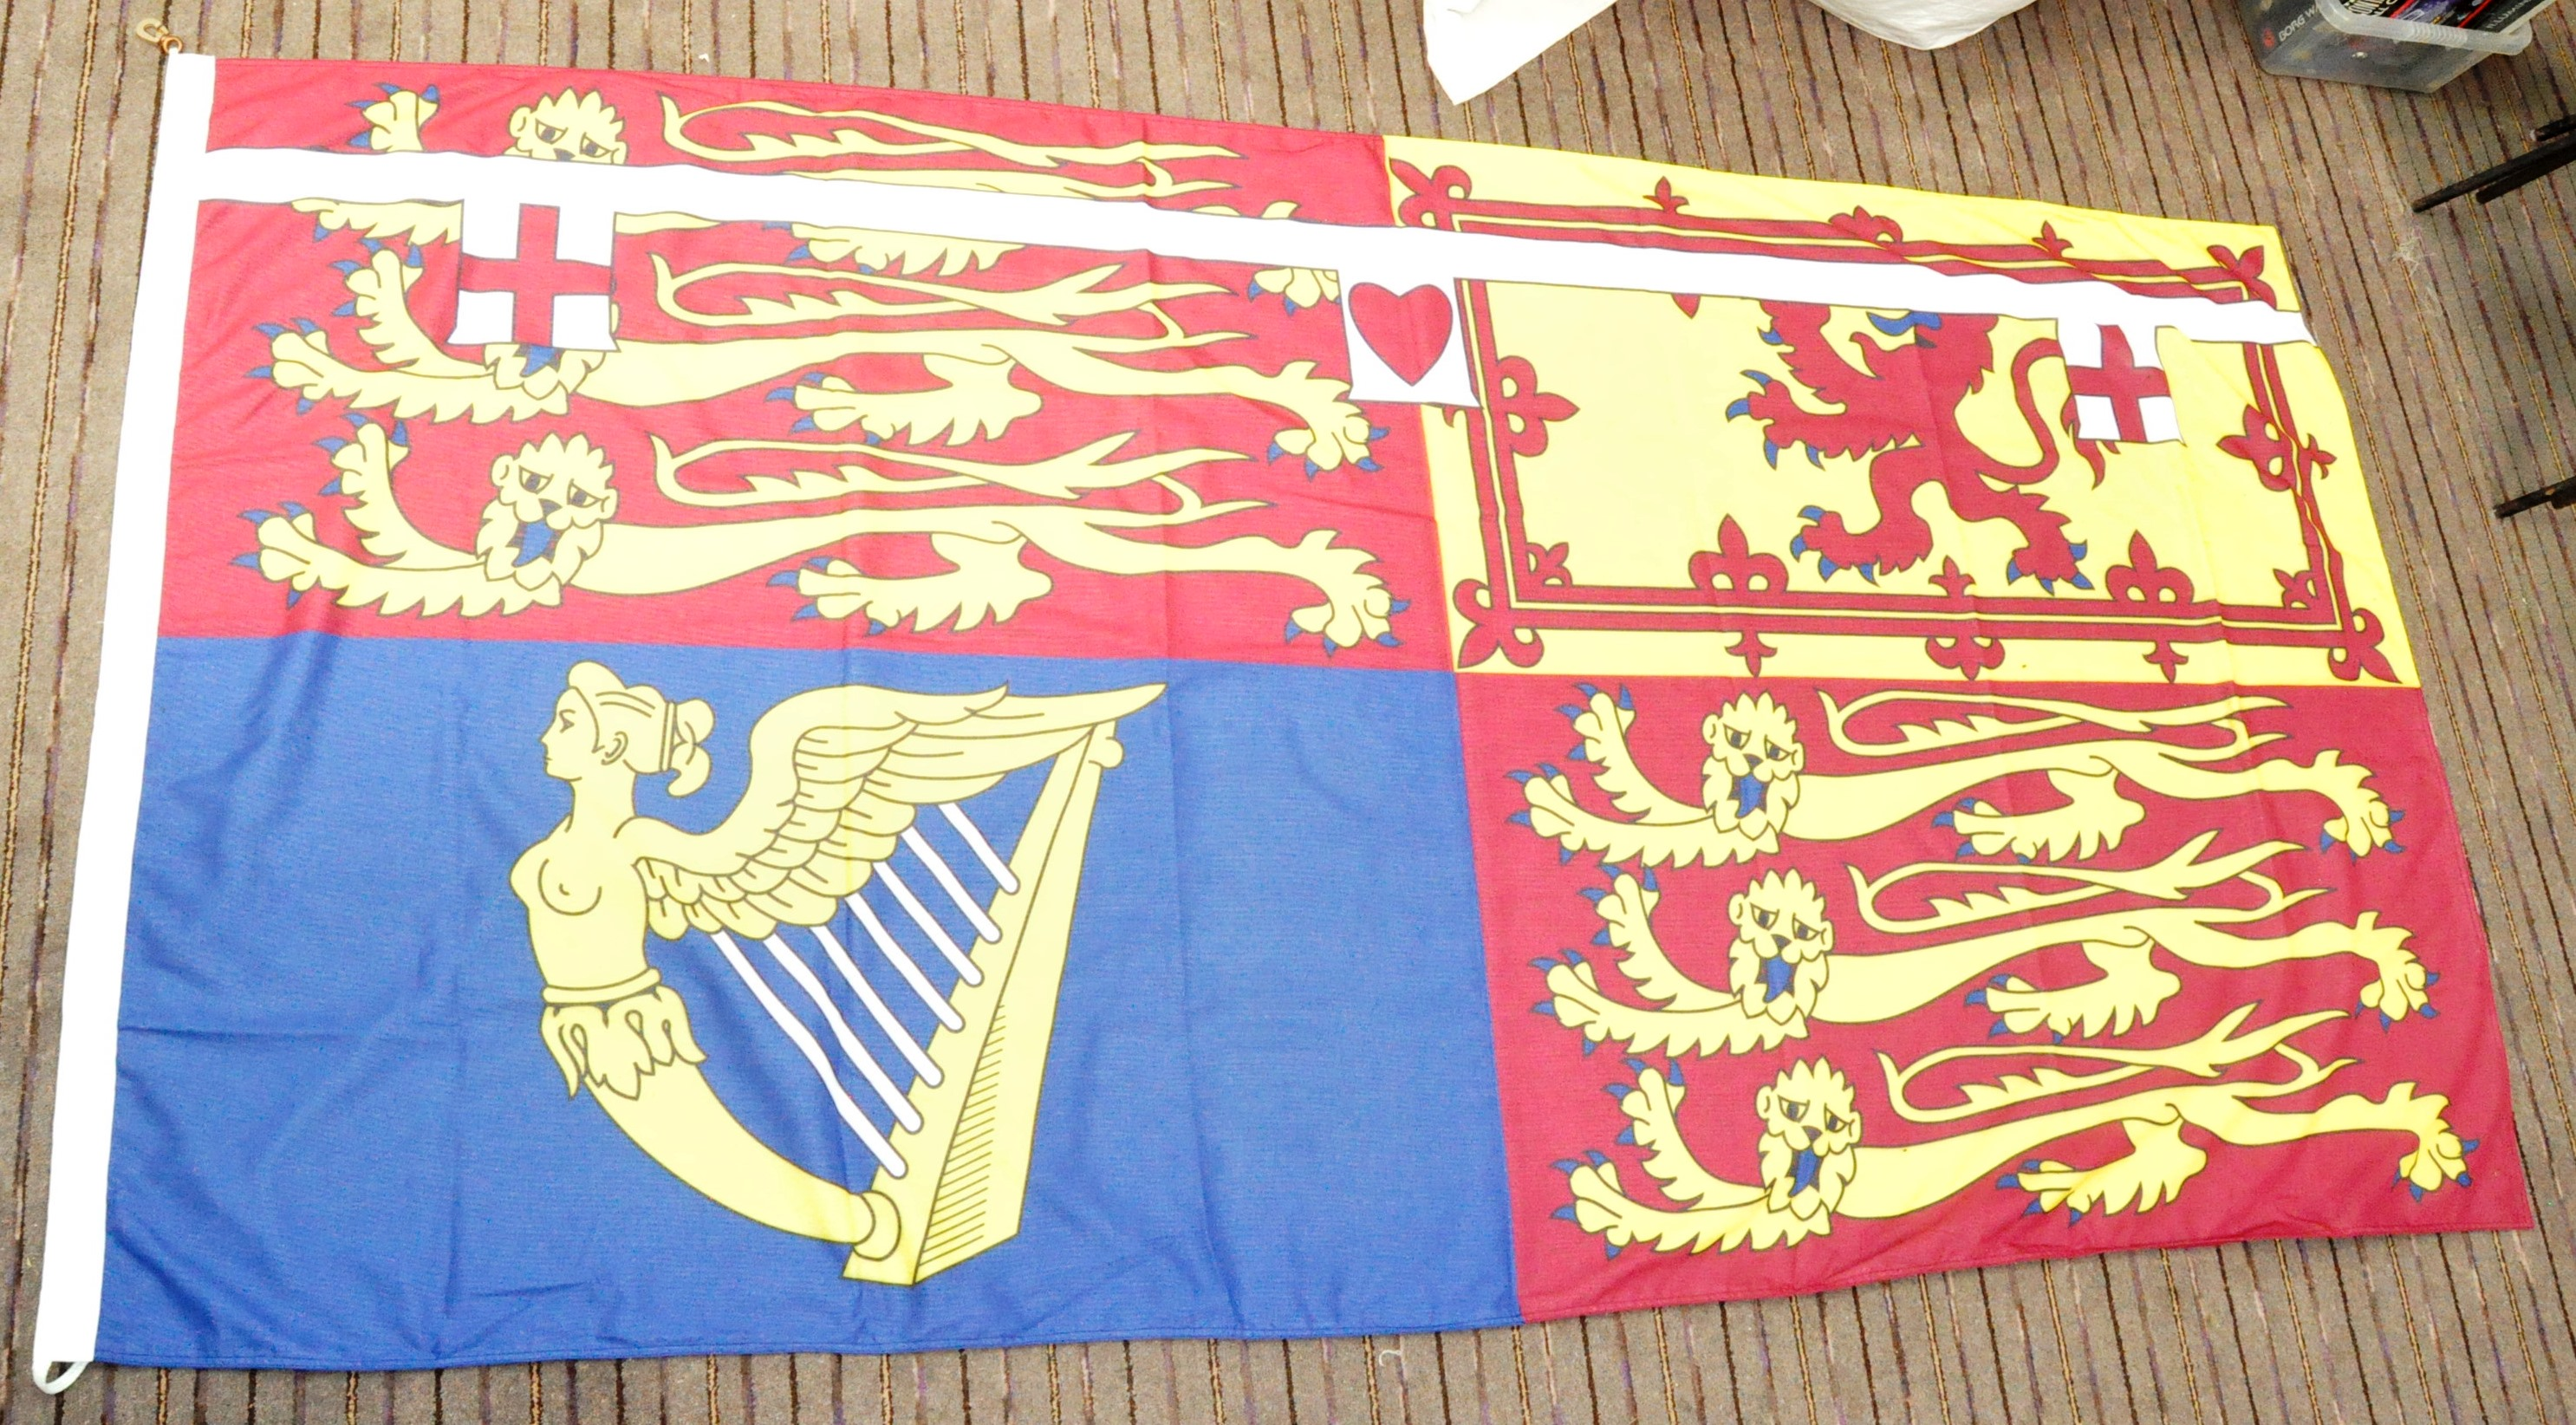 LARGE ROYAL STANDARD OF THE UNITED KINGDOM FLAG - Image 2 of 7